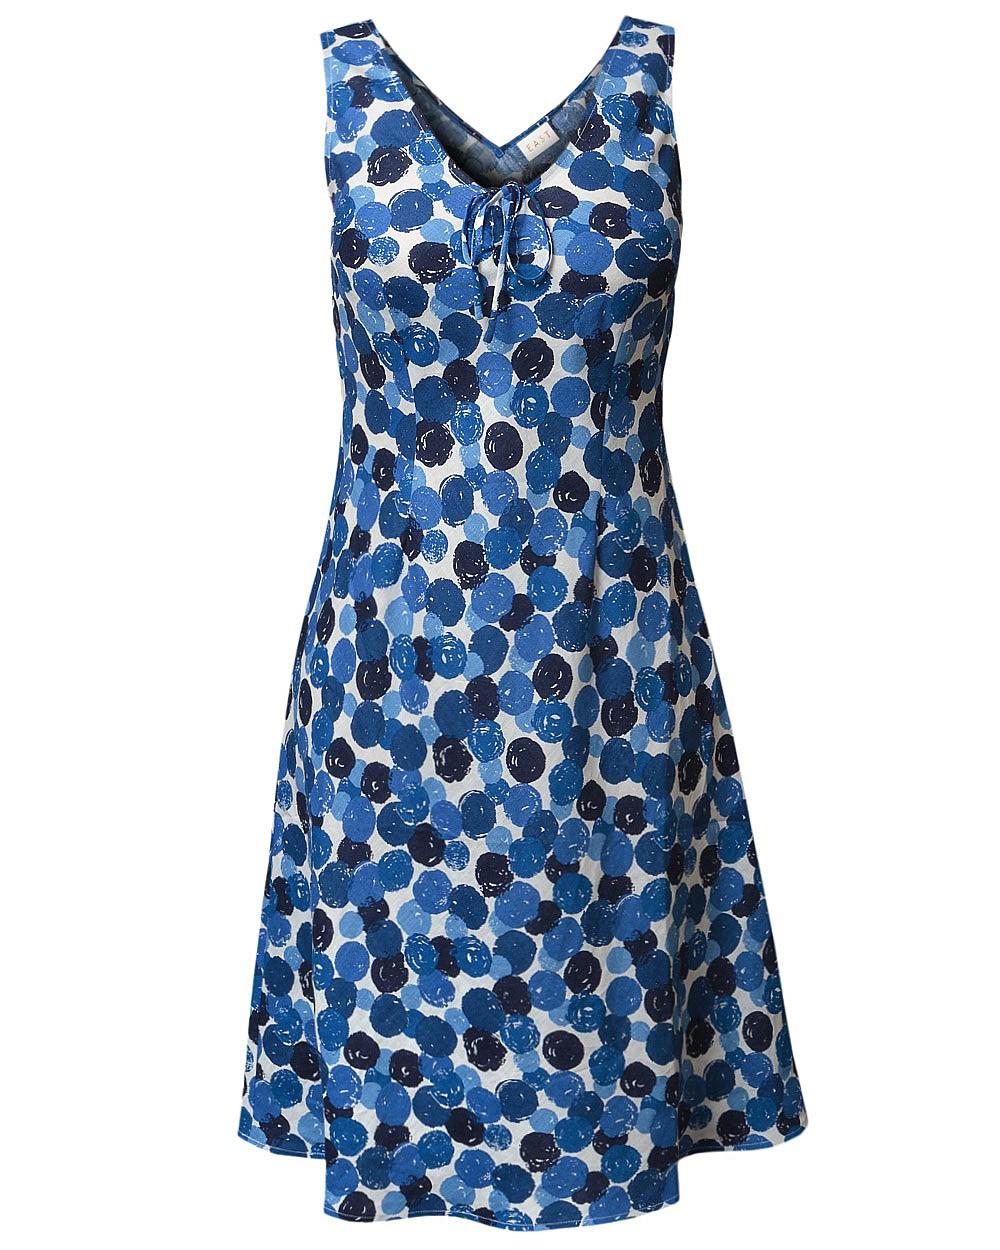 New East Casual Painted Spot Sundress V-Neck Knee Length w/Tie Waist Linen Blue